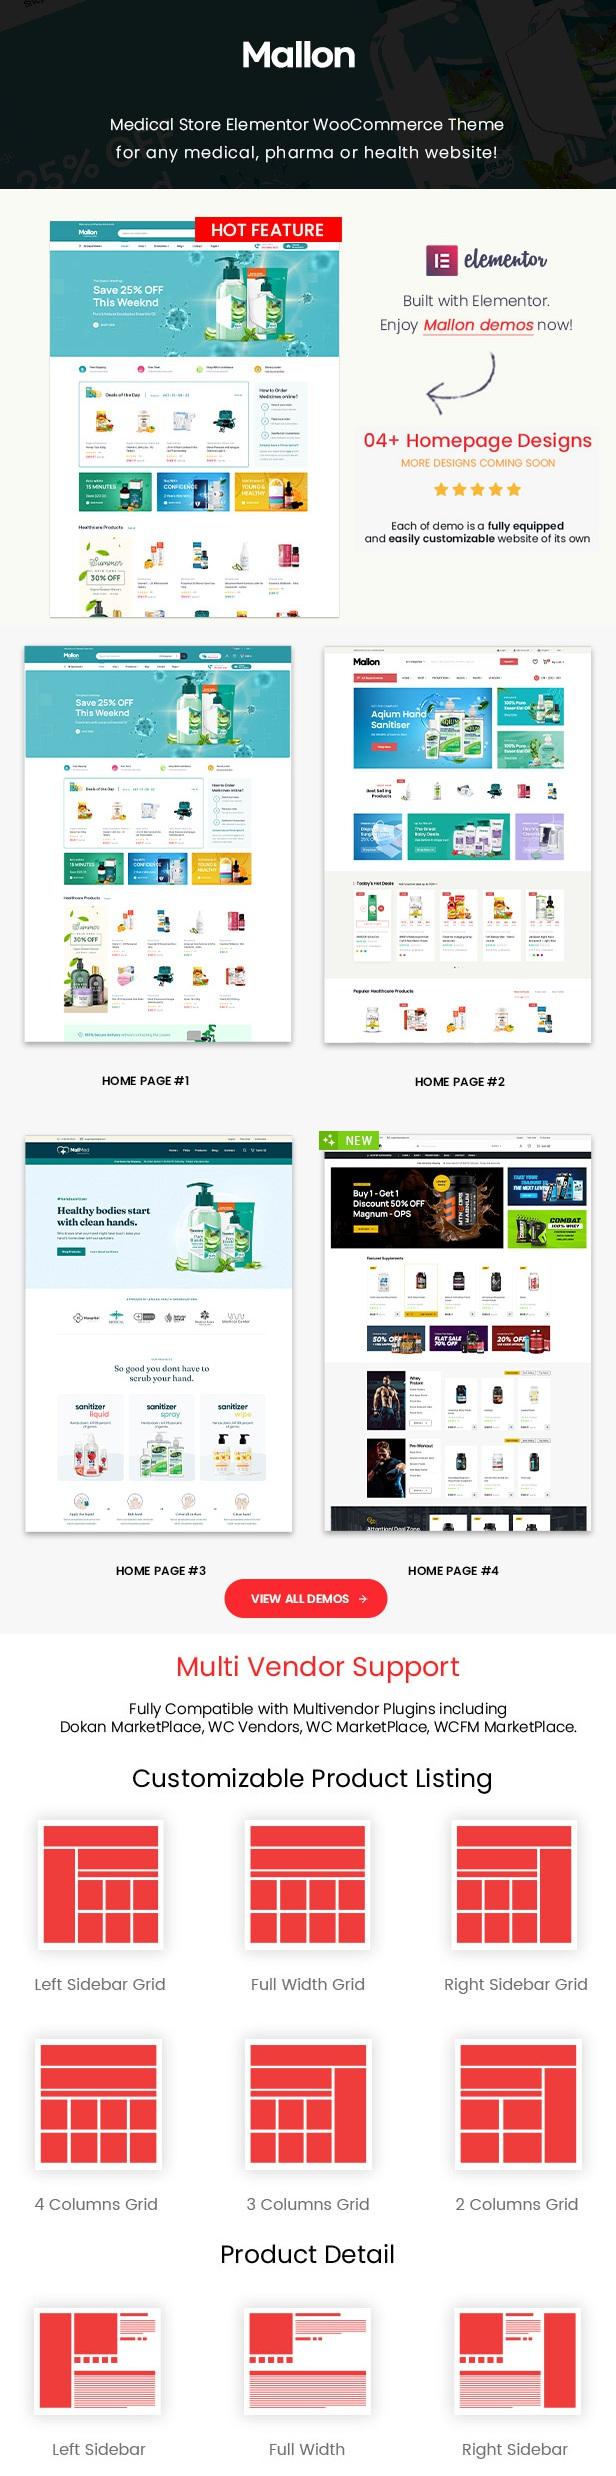 Medical Store Elementor WooCommerce WordPress Theme